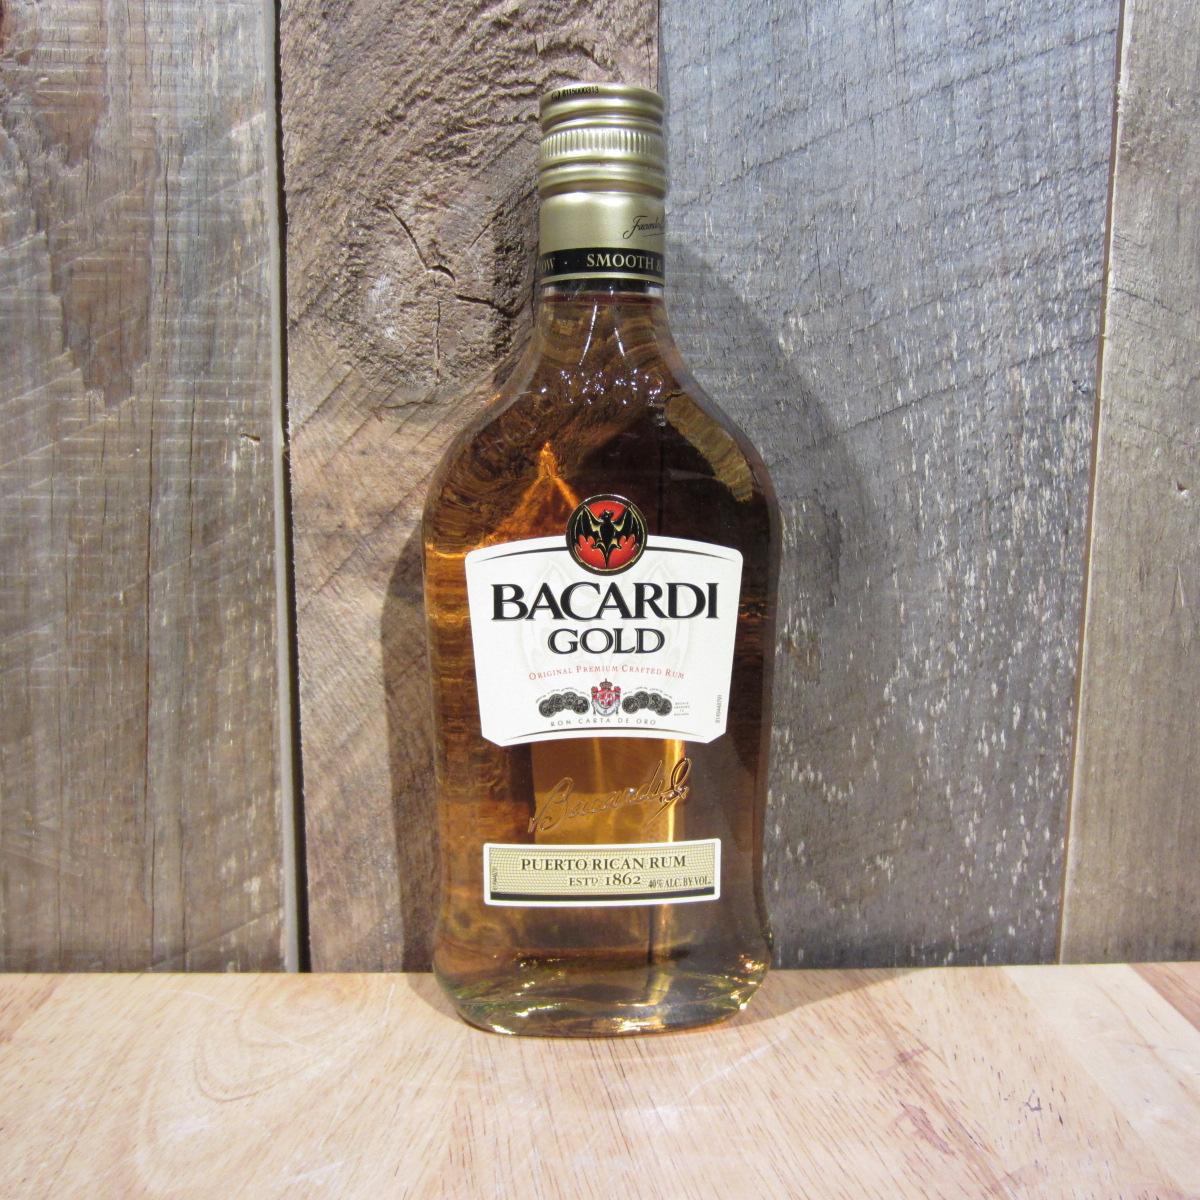 BACARDI GOLD 375ML PINTS HALF SIZE BTLS  Oak and Barrel